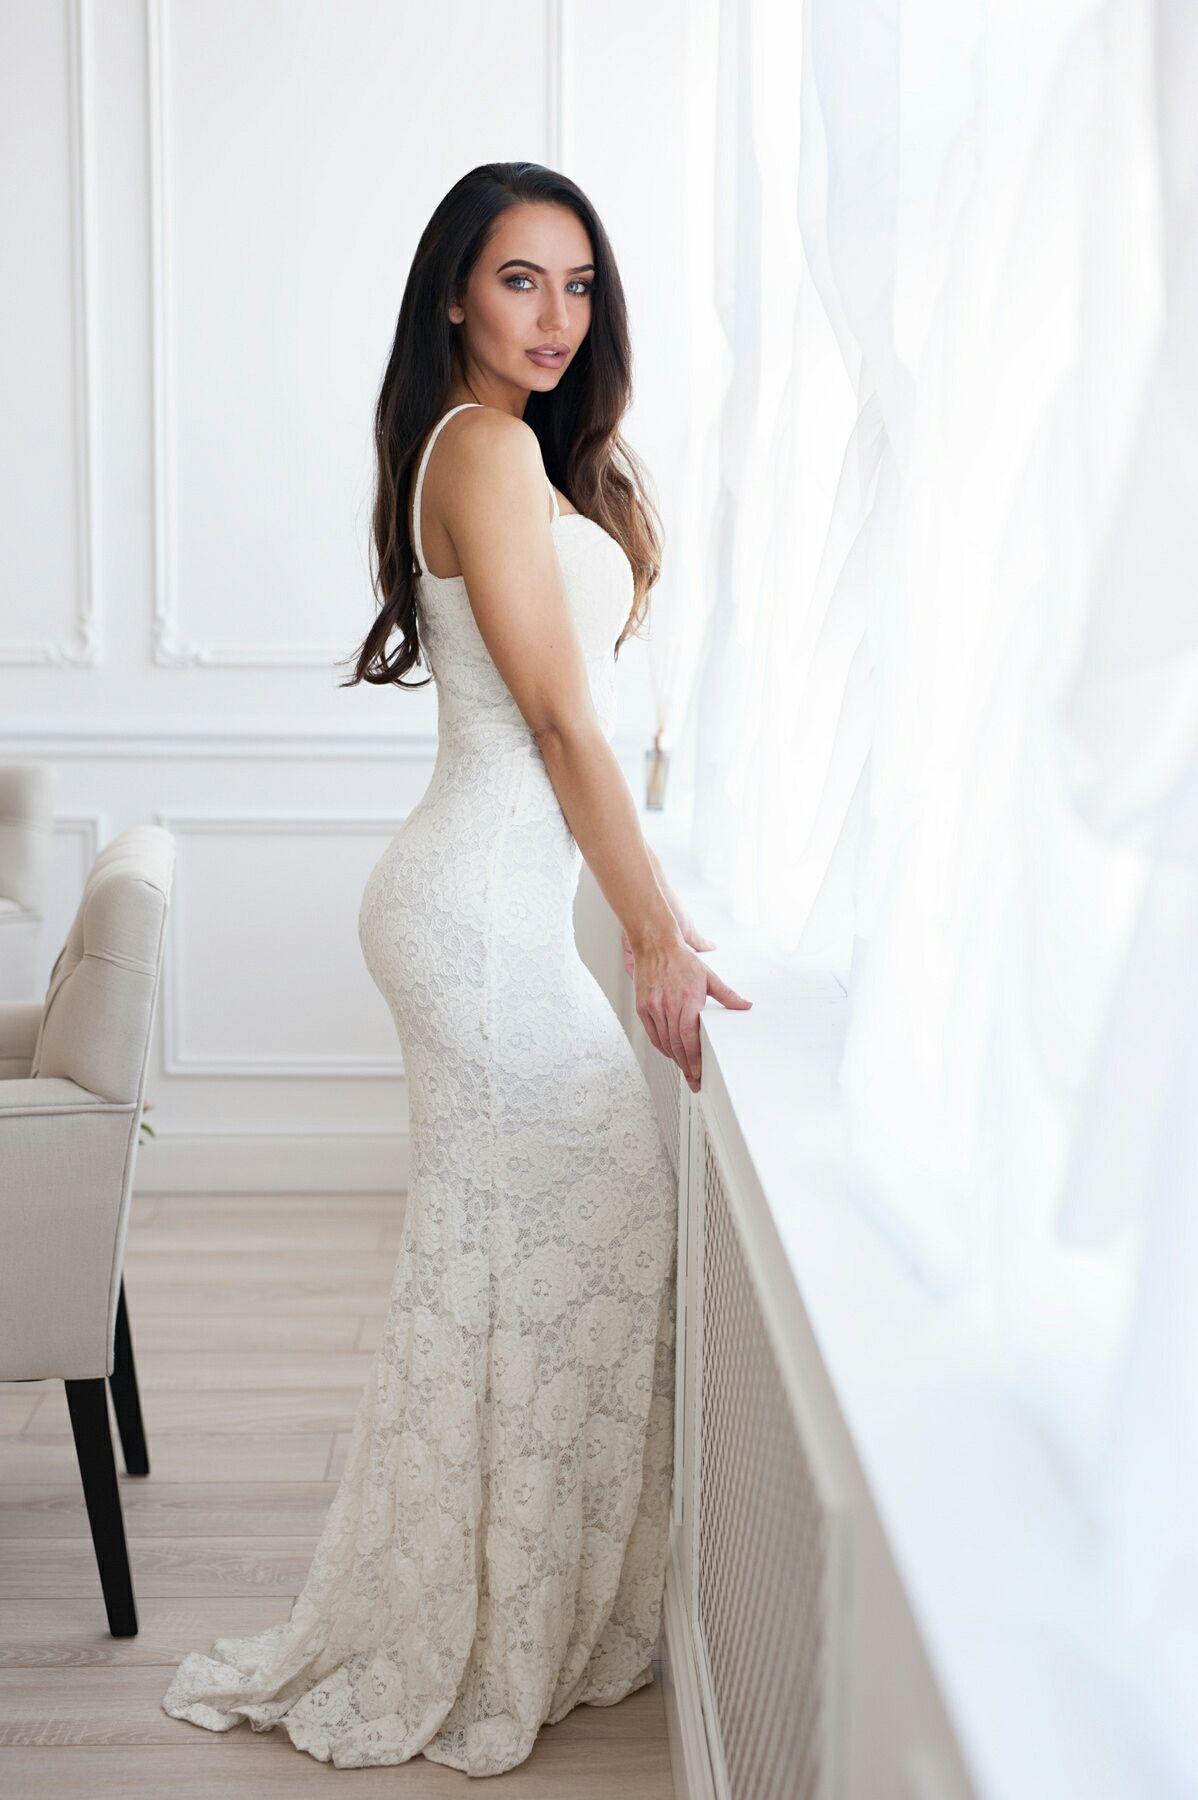 Twitter Sanna-Maria Seilamo nude (95 photos), Pussy, Cleavage, Selfie, bra 2020